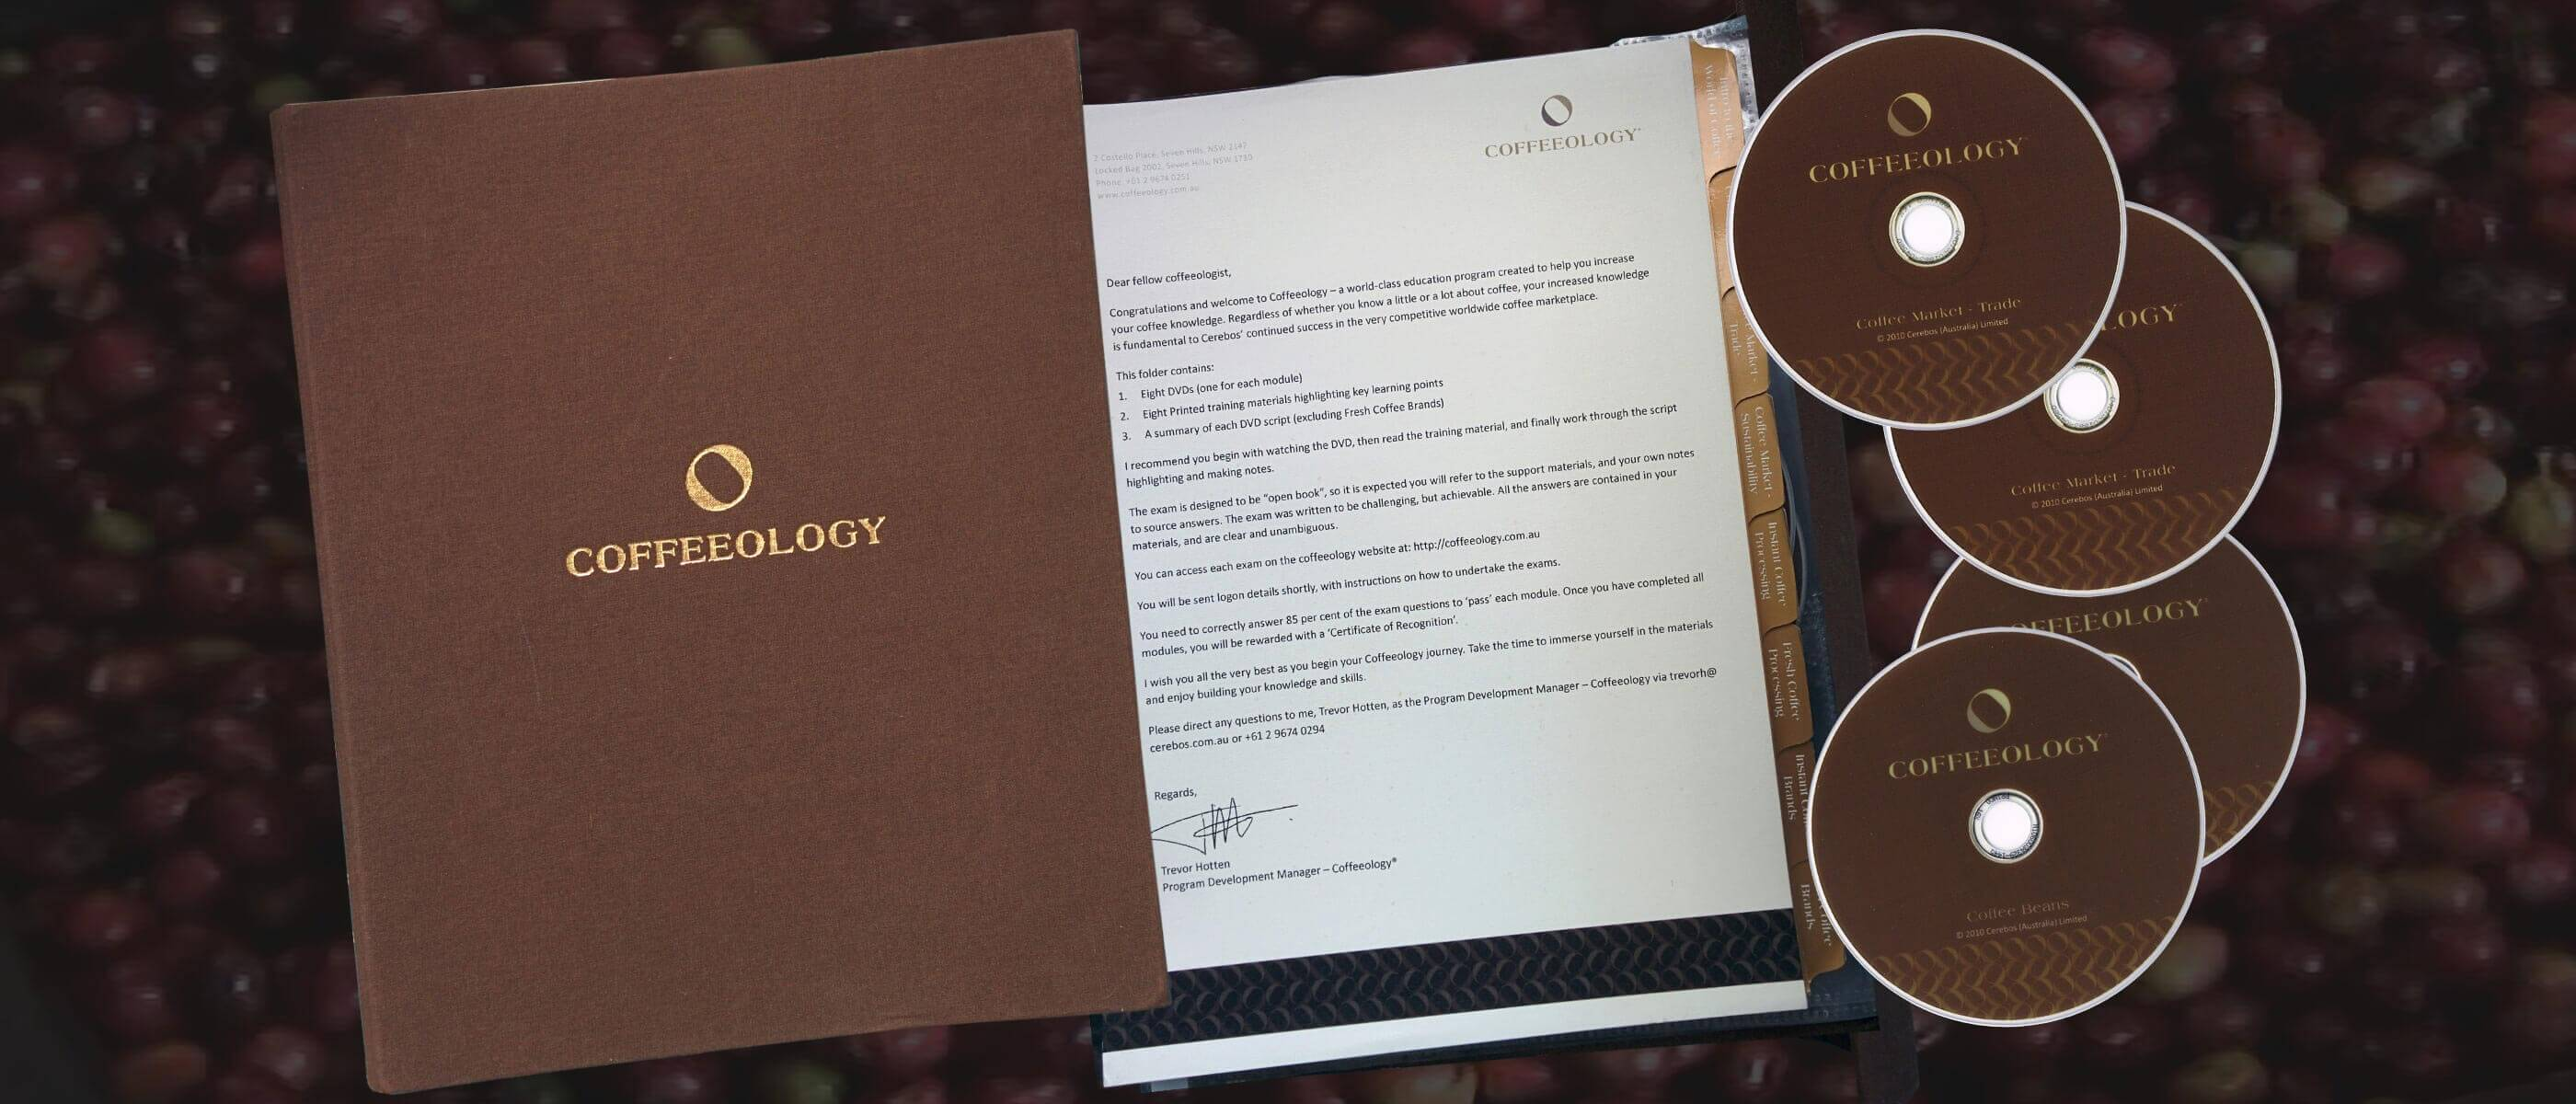 coffeeology-videaos-image